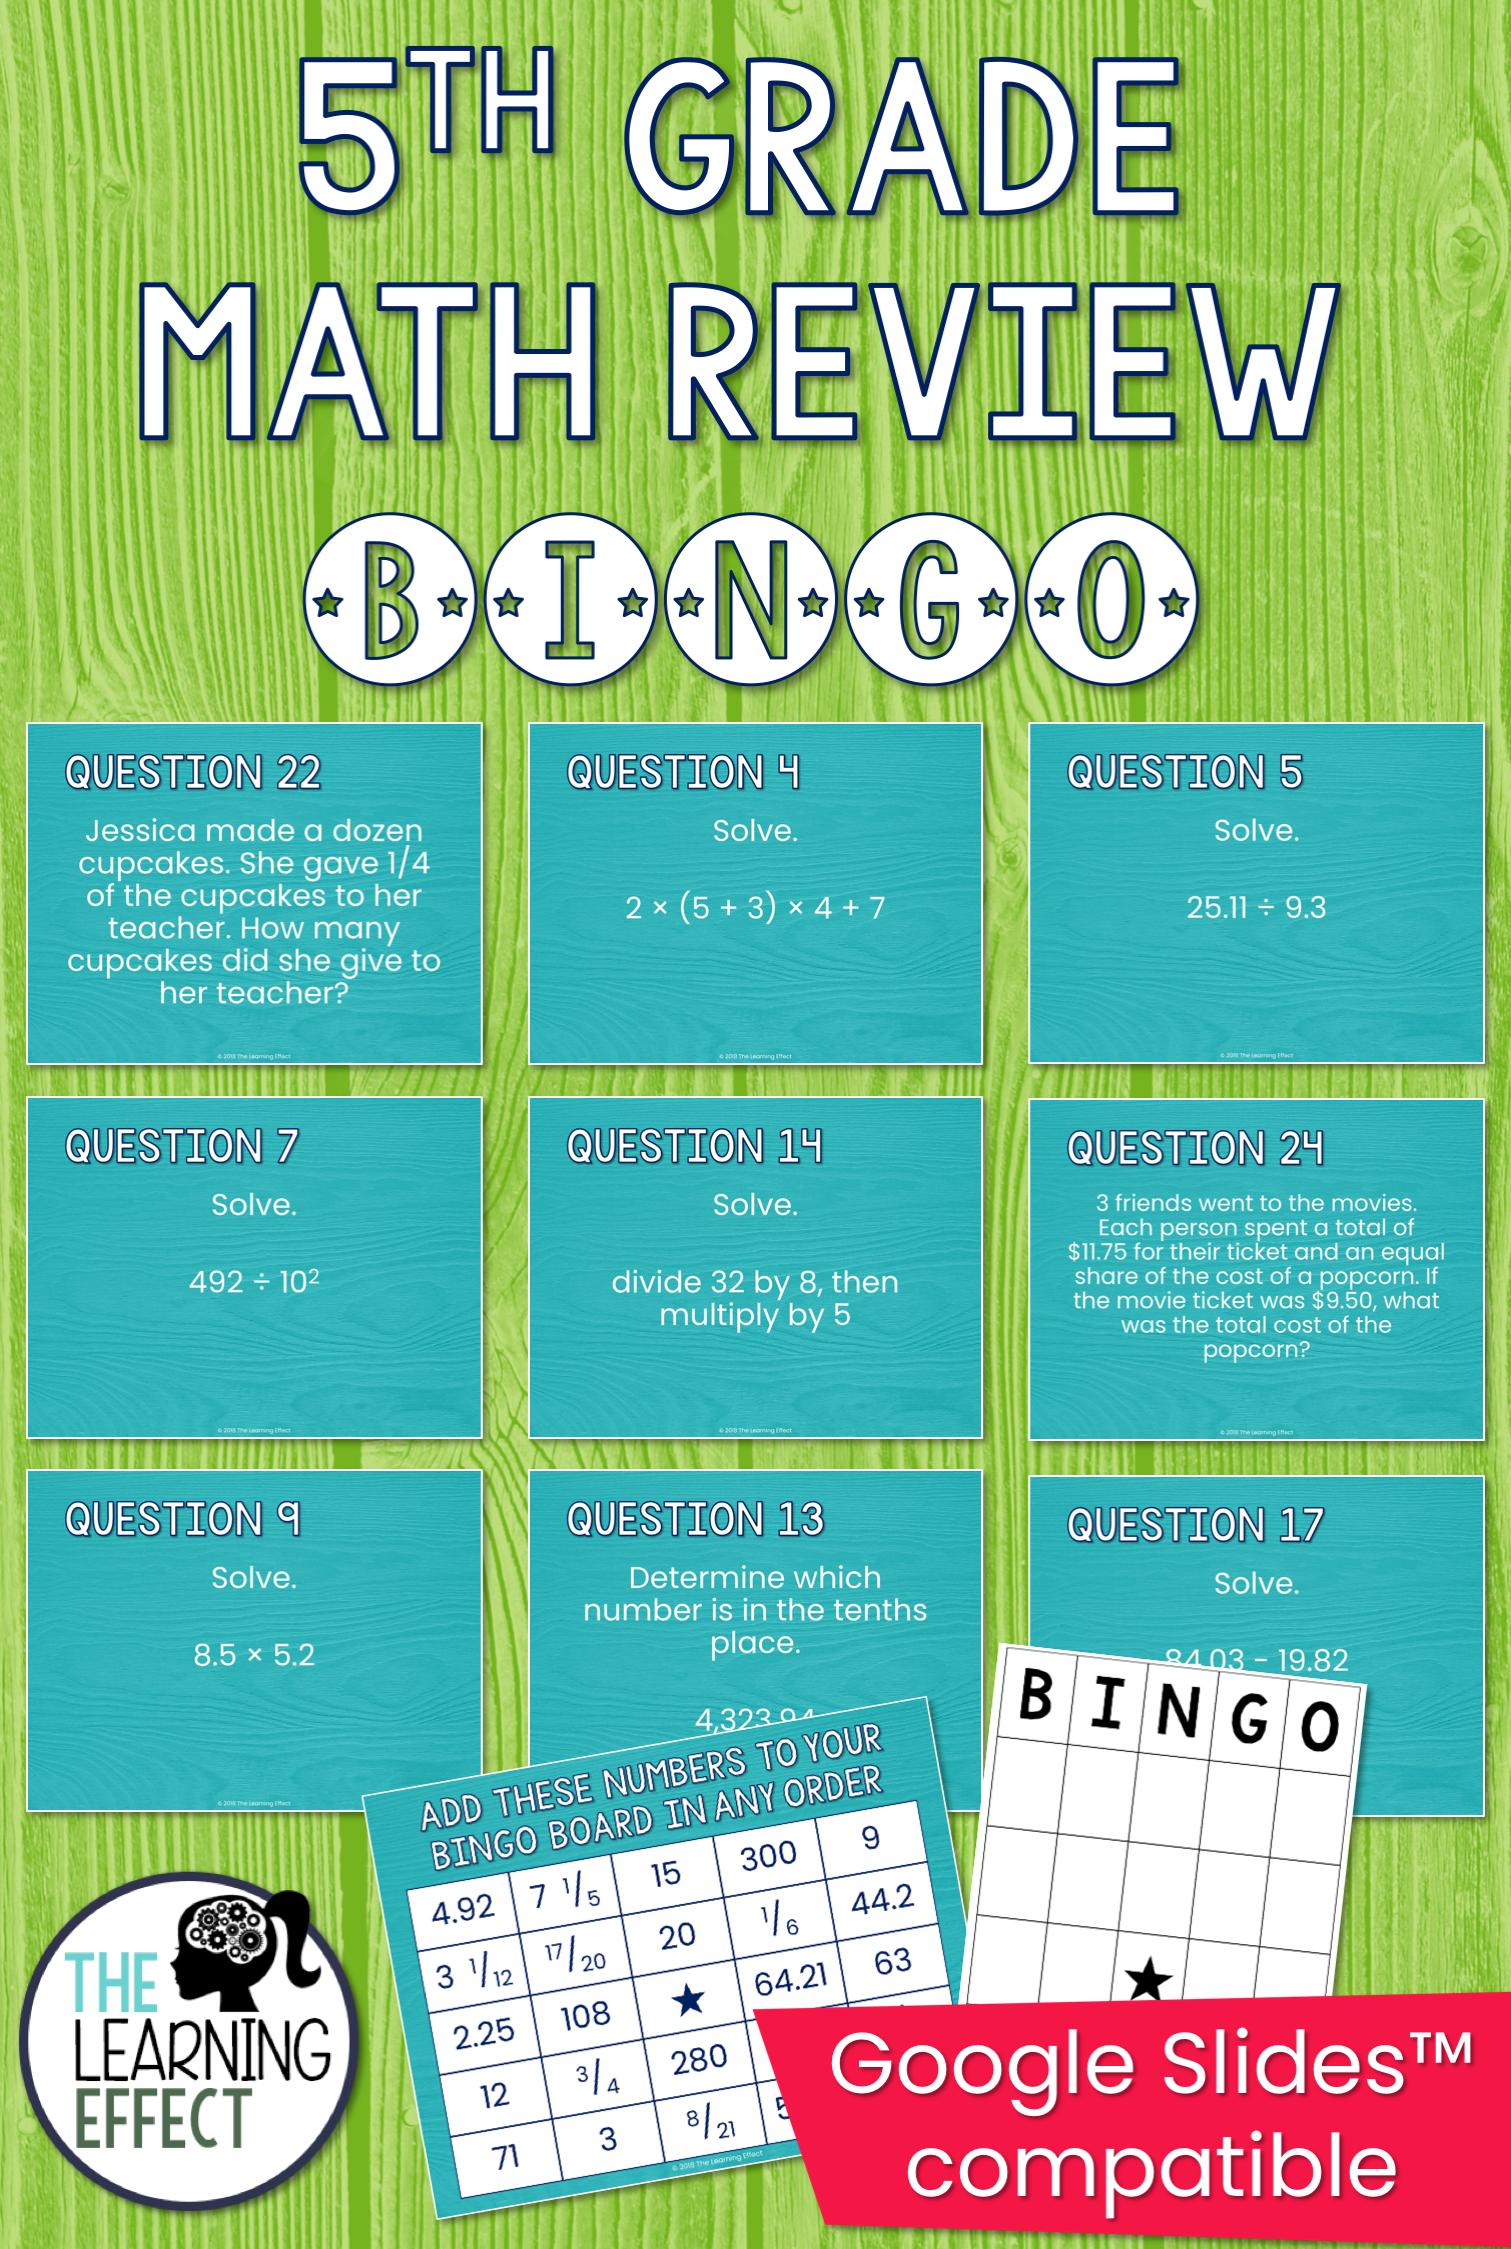 5th Grade Math Review Bingo Game | Test Prep | Assessments & Test ...